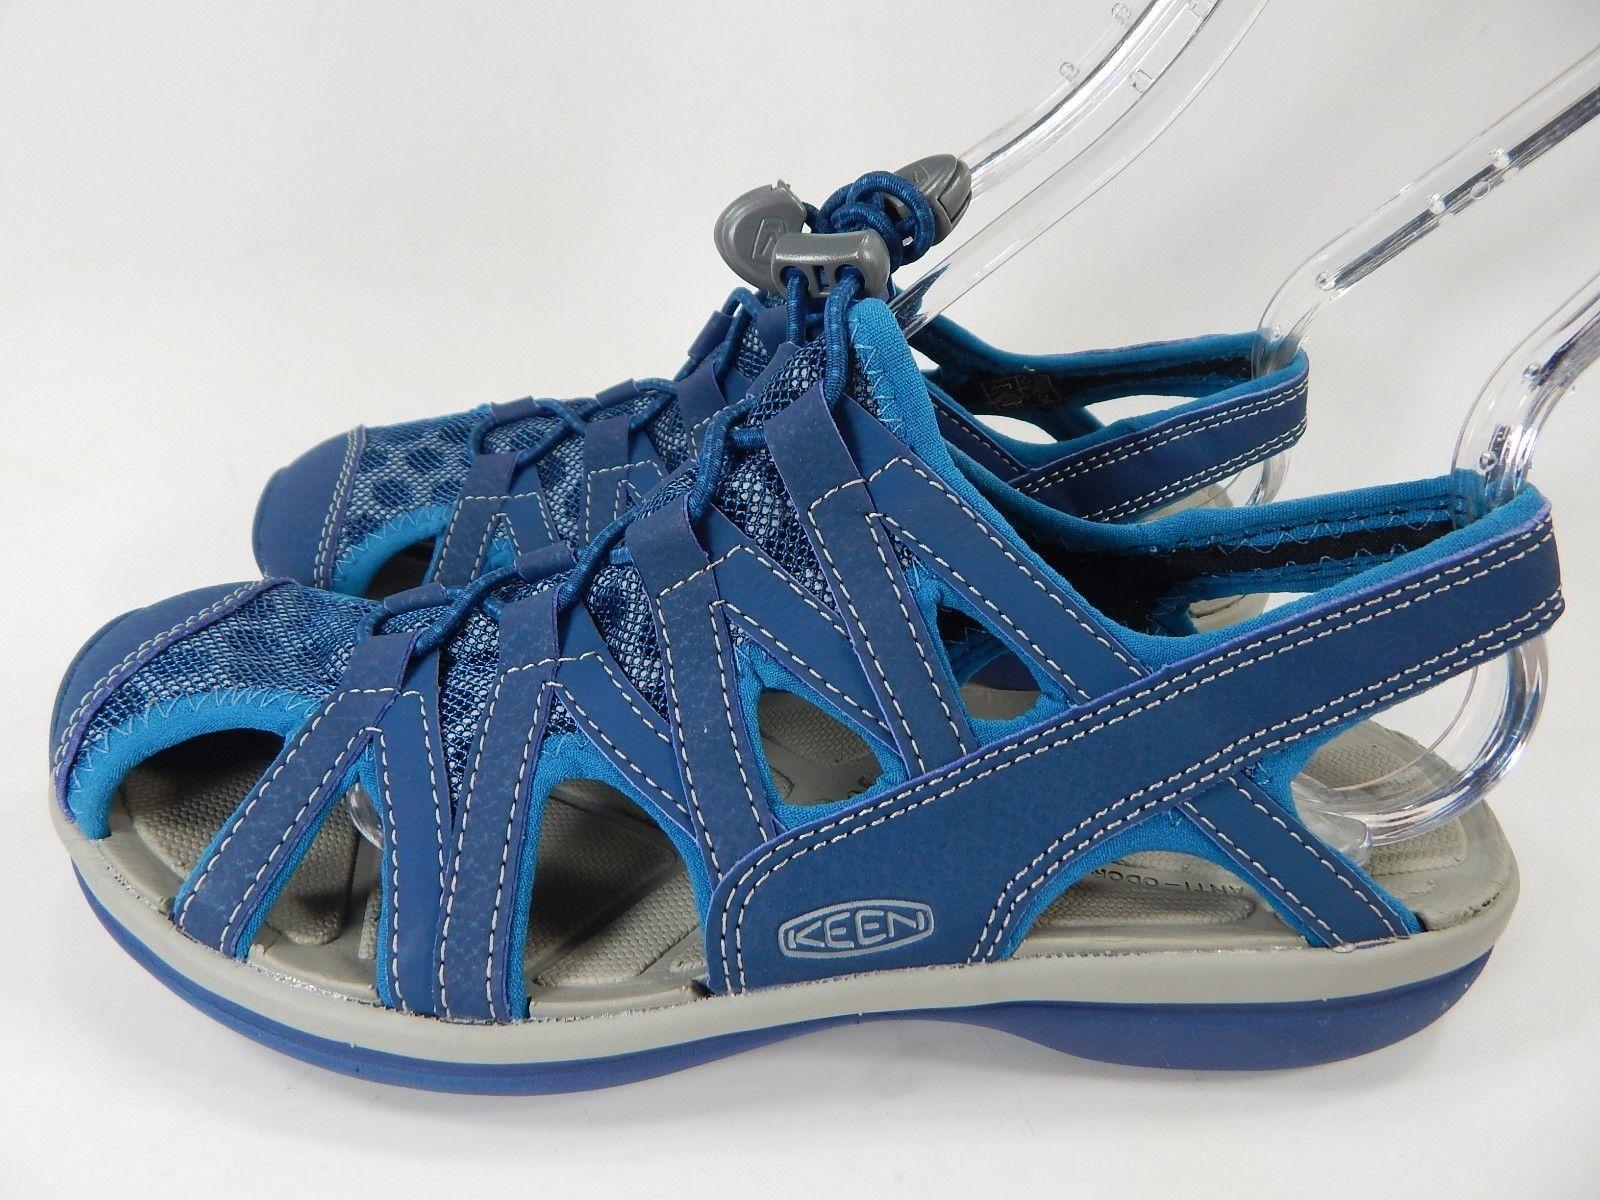 9ae106ebea5c Keen Sage Size US 7 M (B) EU 37.5 Women s Sport Sandals Poseidon